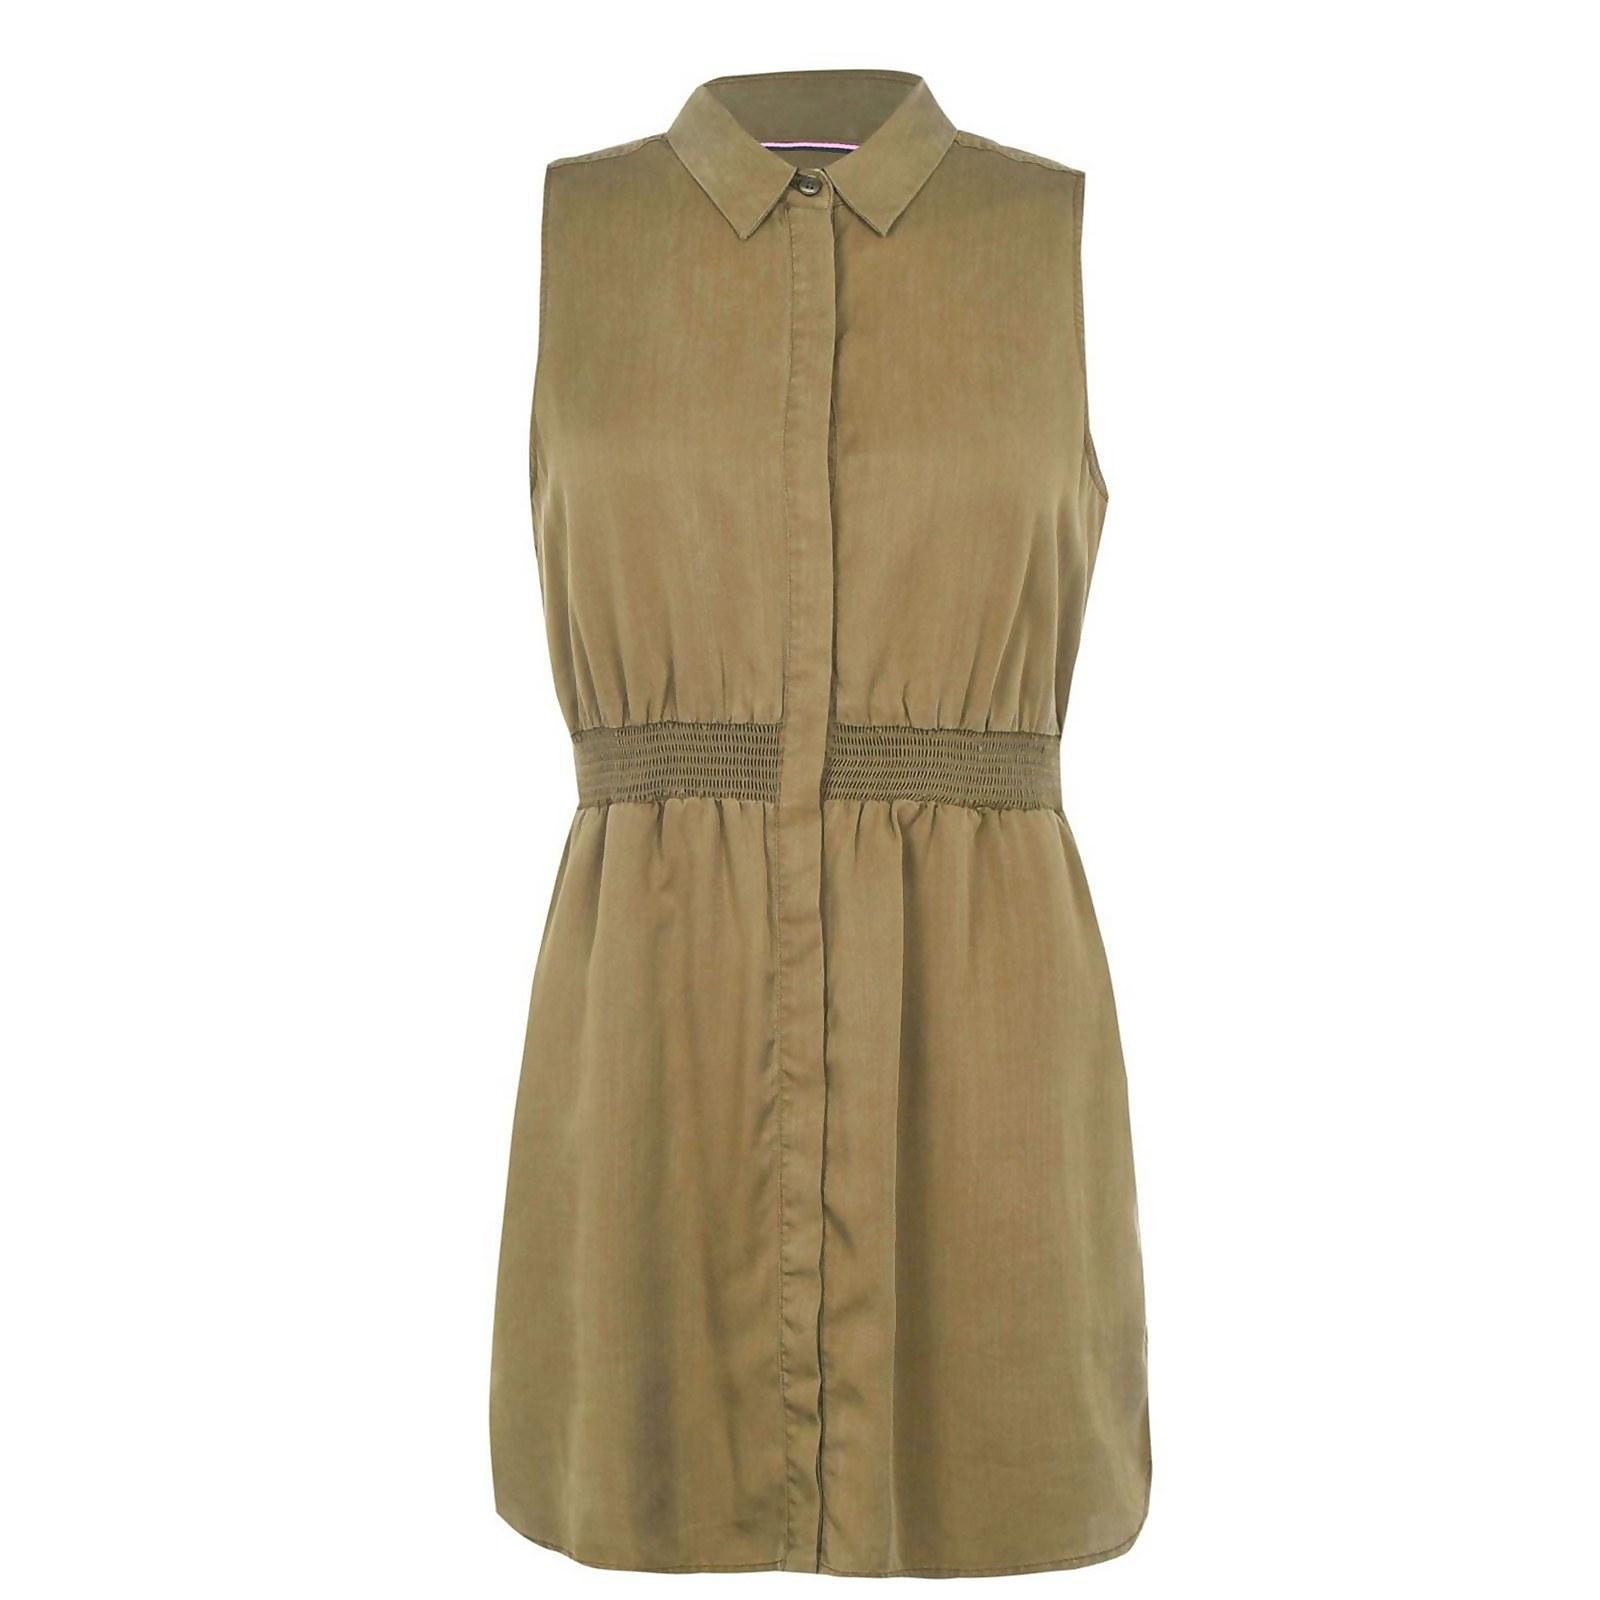 Ruckhall Sleeveless Shirt Dress - Olive